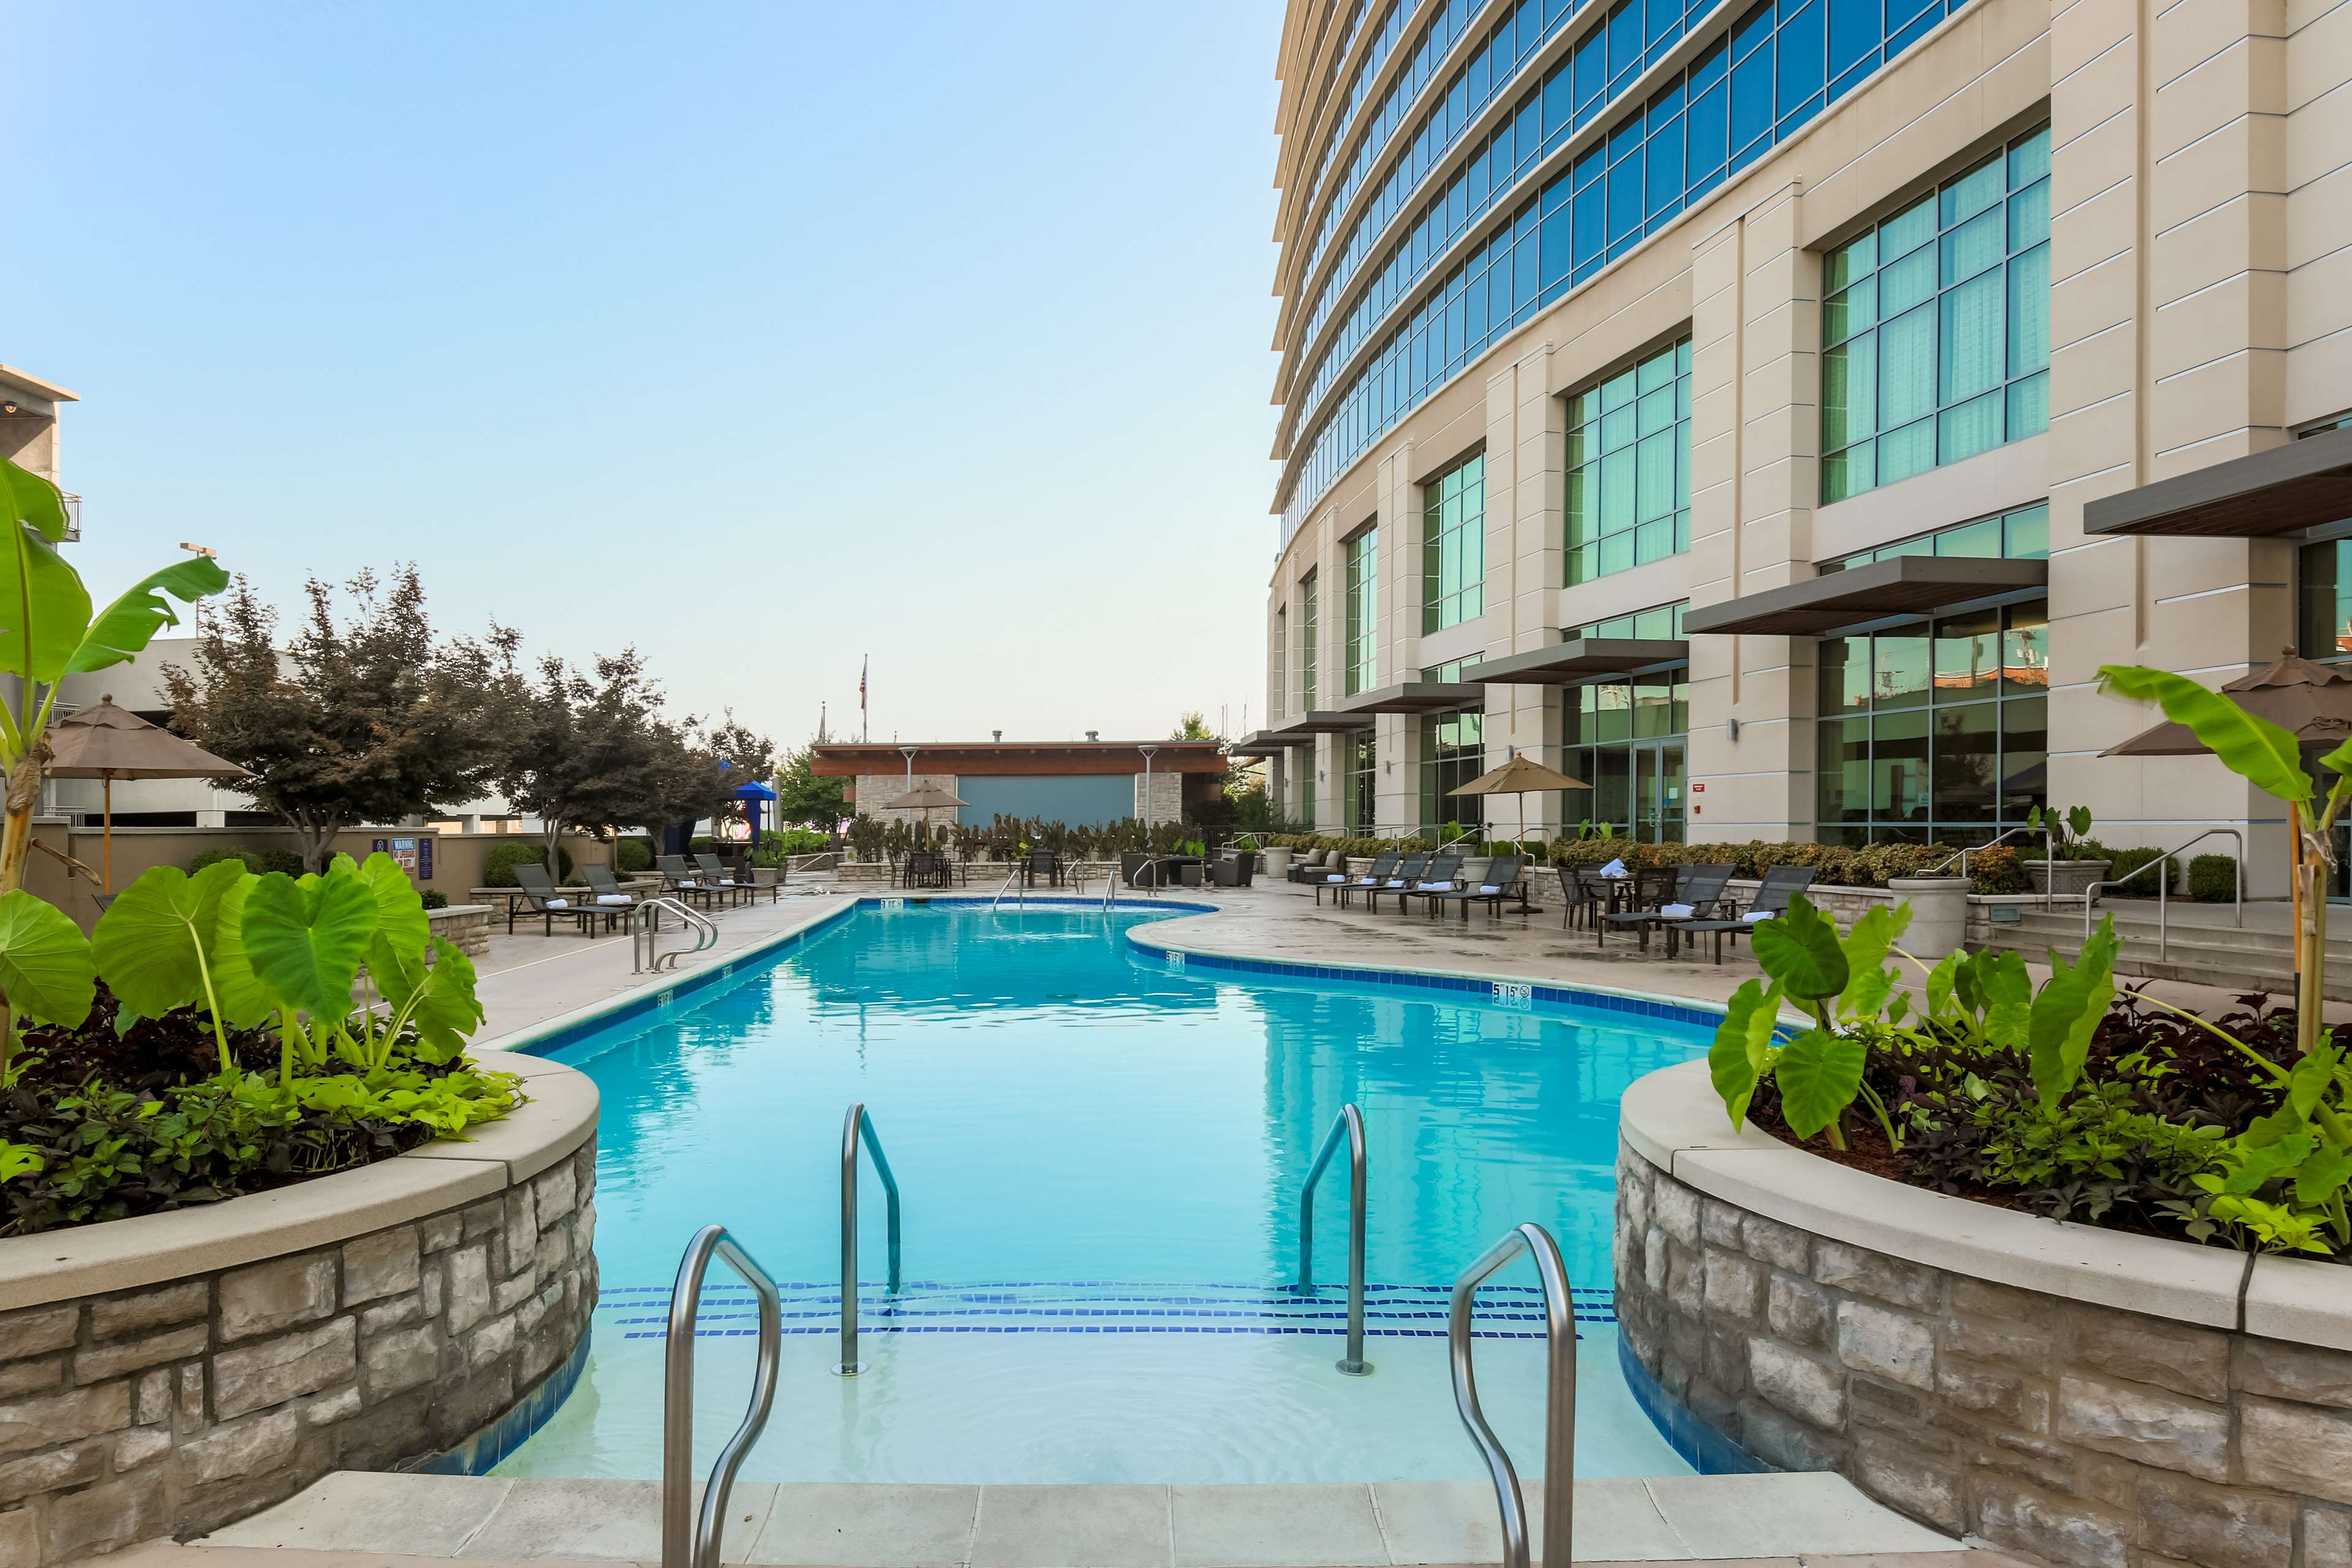 Hilton Branson Convention Center image 7